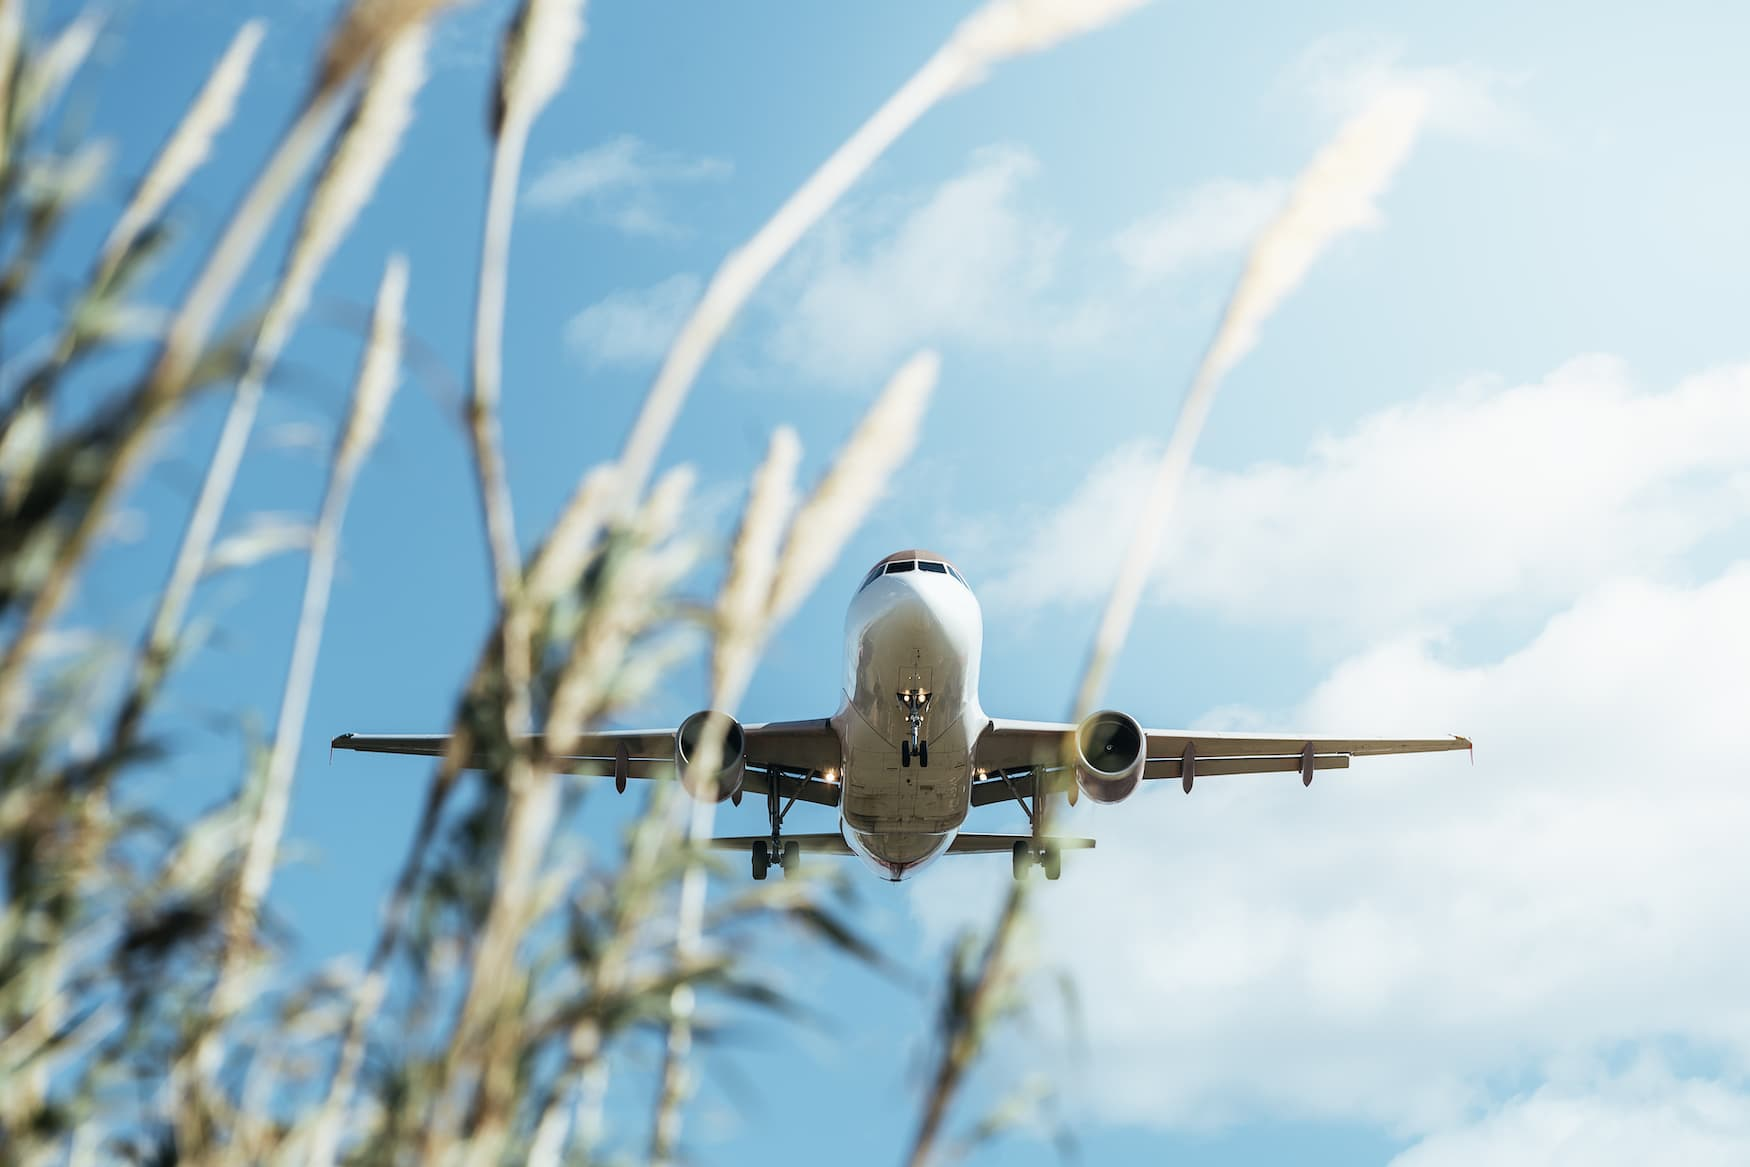 Flugzeug hinter Graswedeln